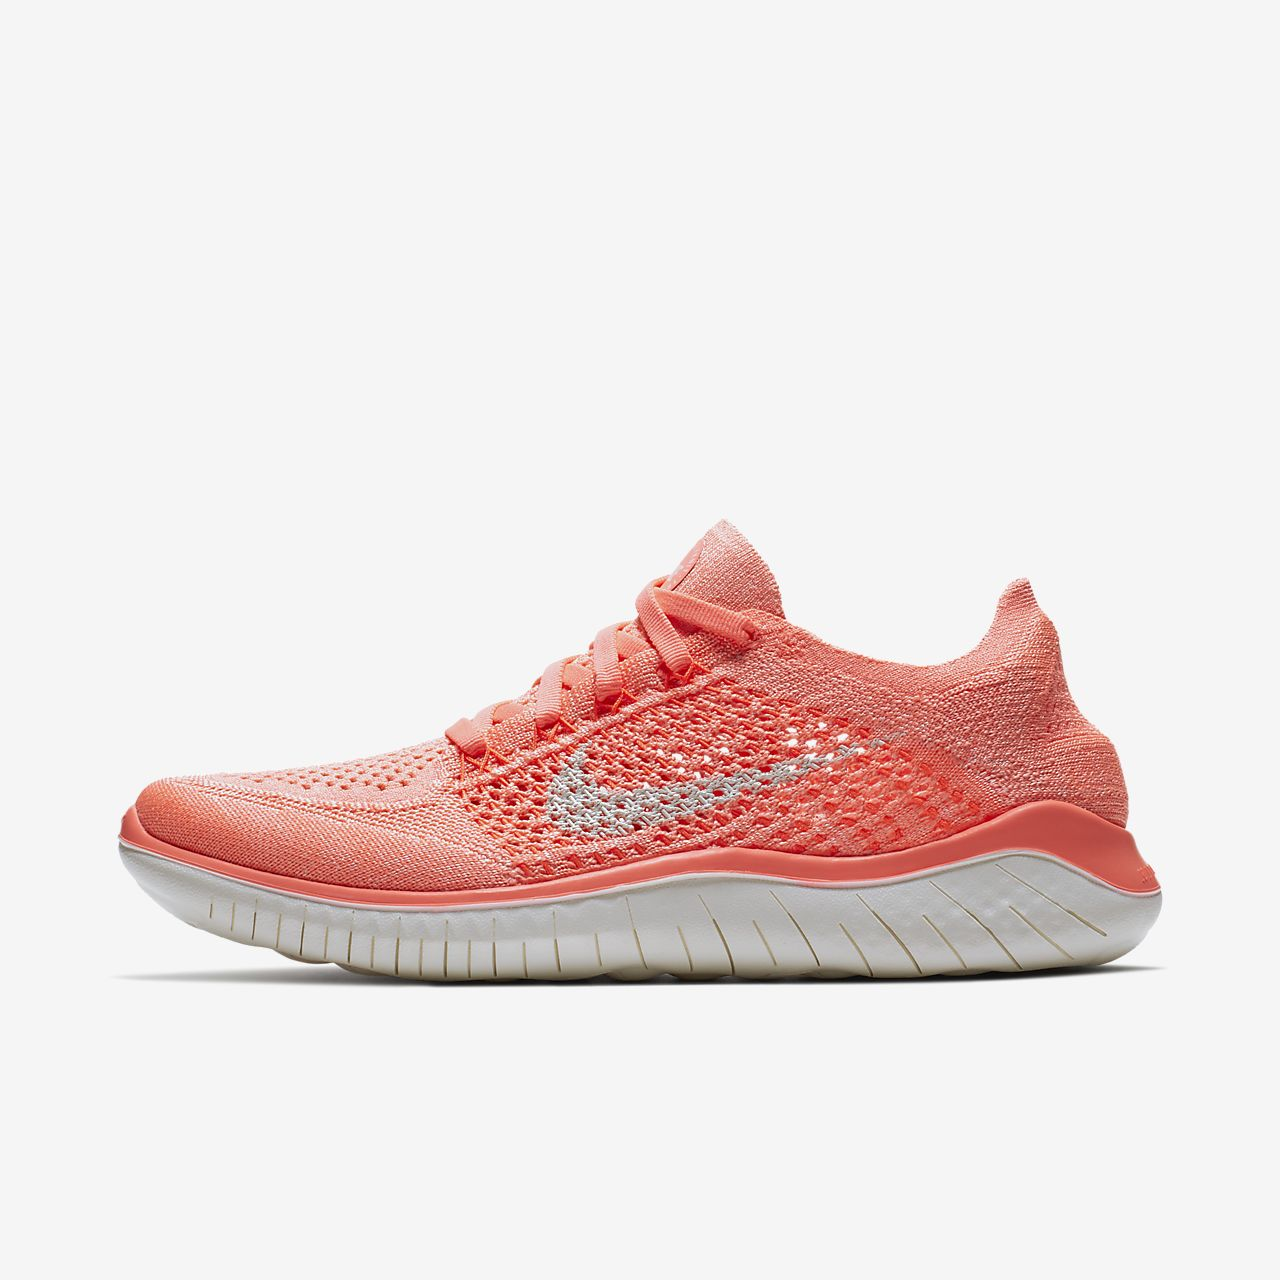 Nike Free RN Flyknit 2018 Damen-Laufschuh - Pink P5pihJ